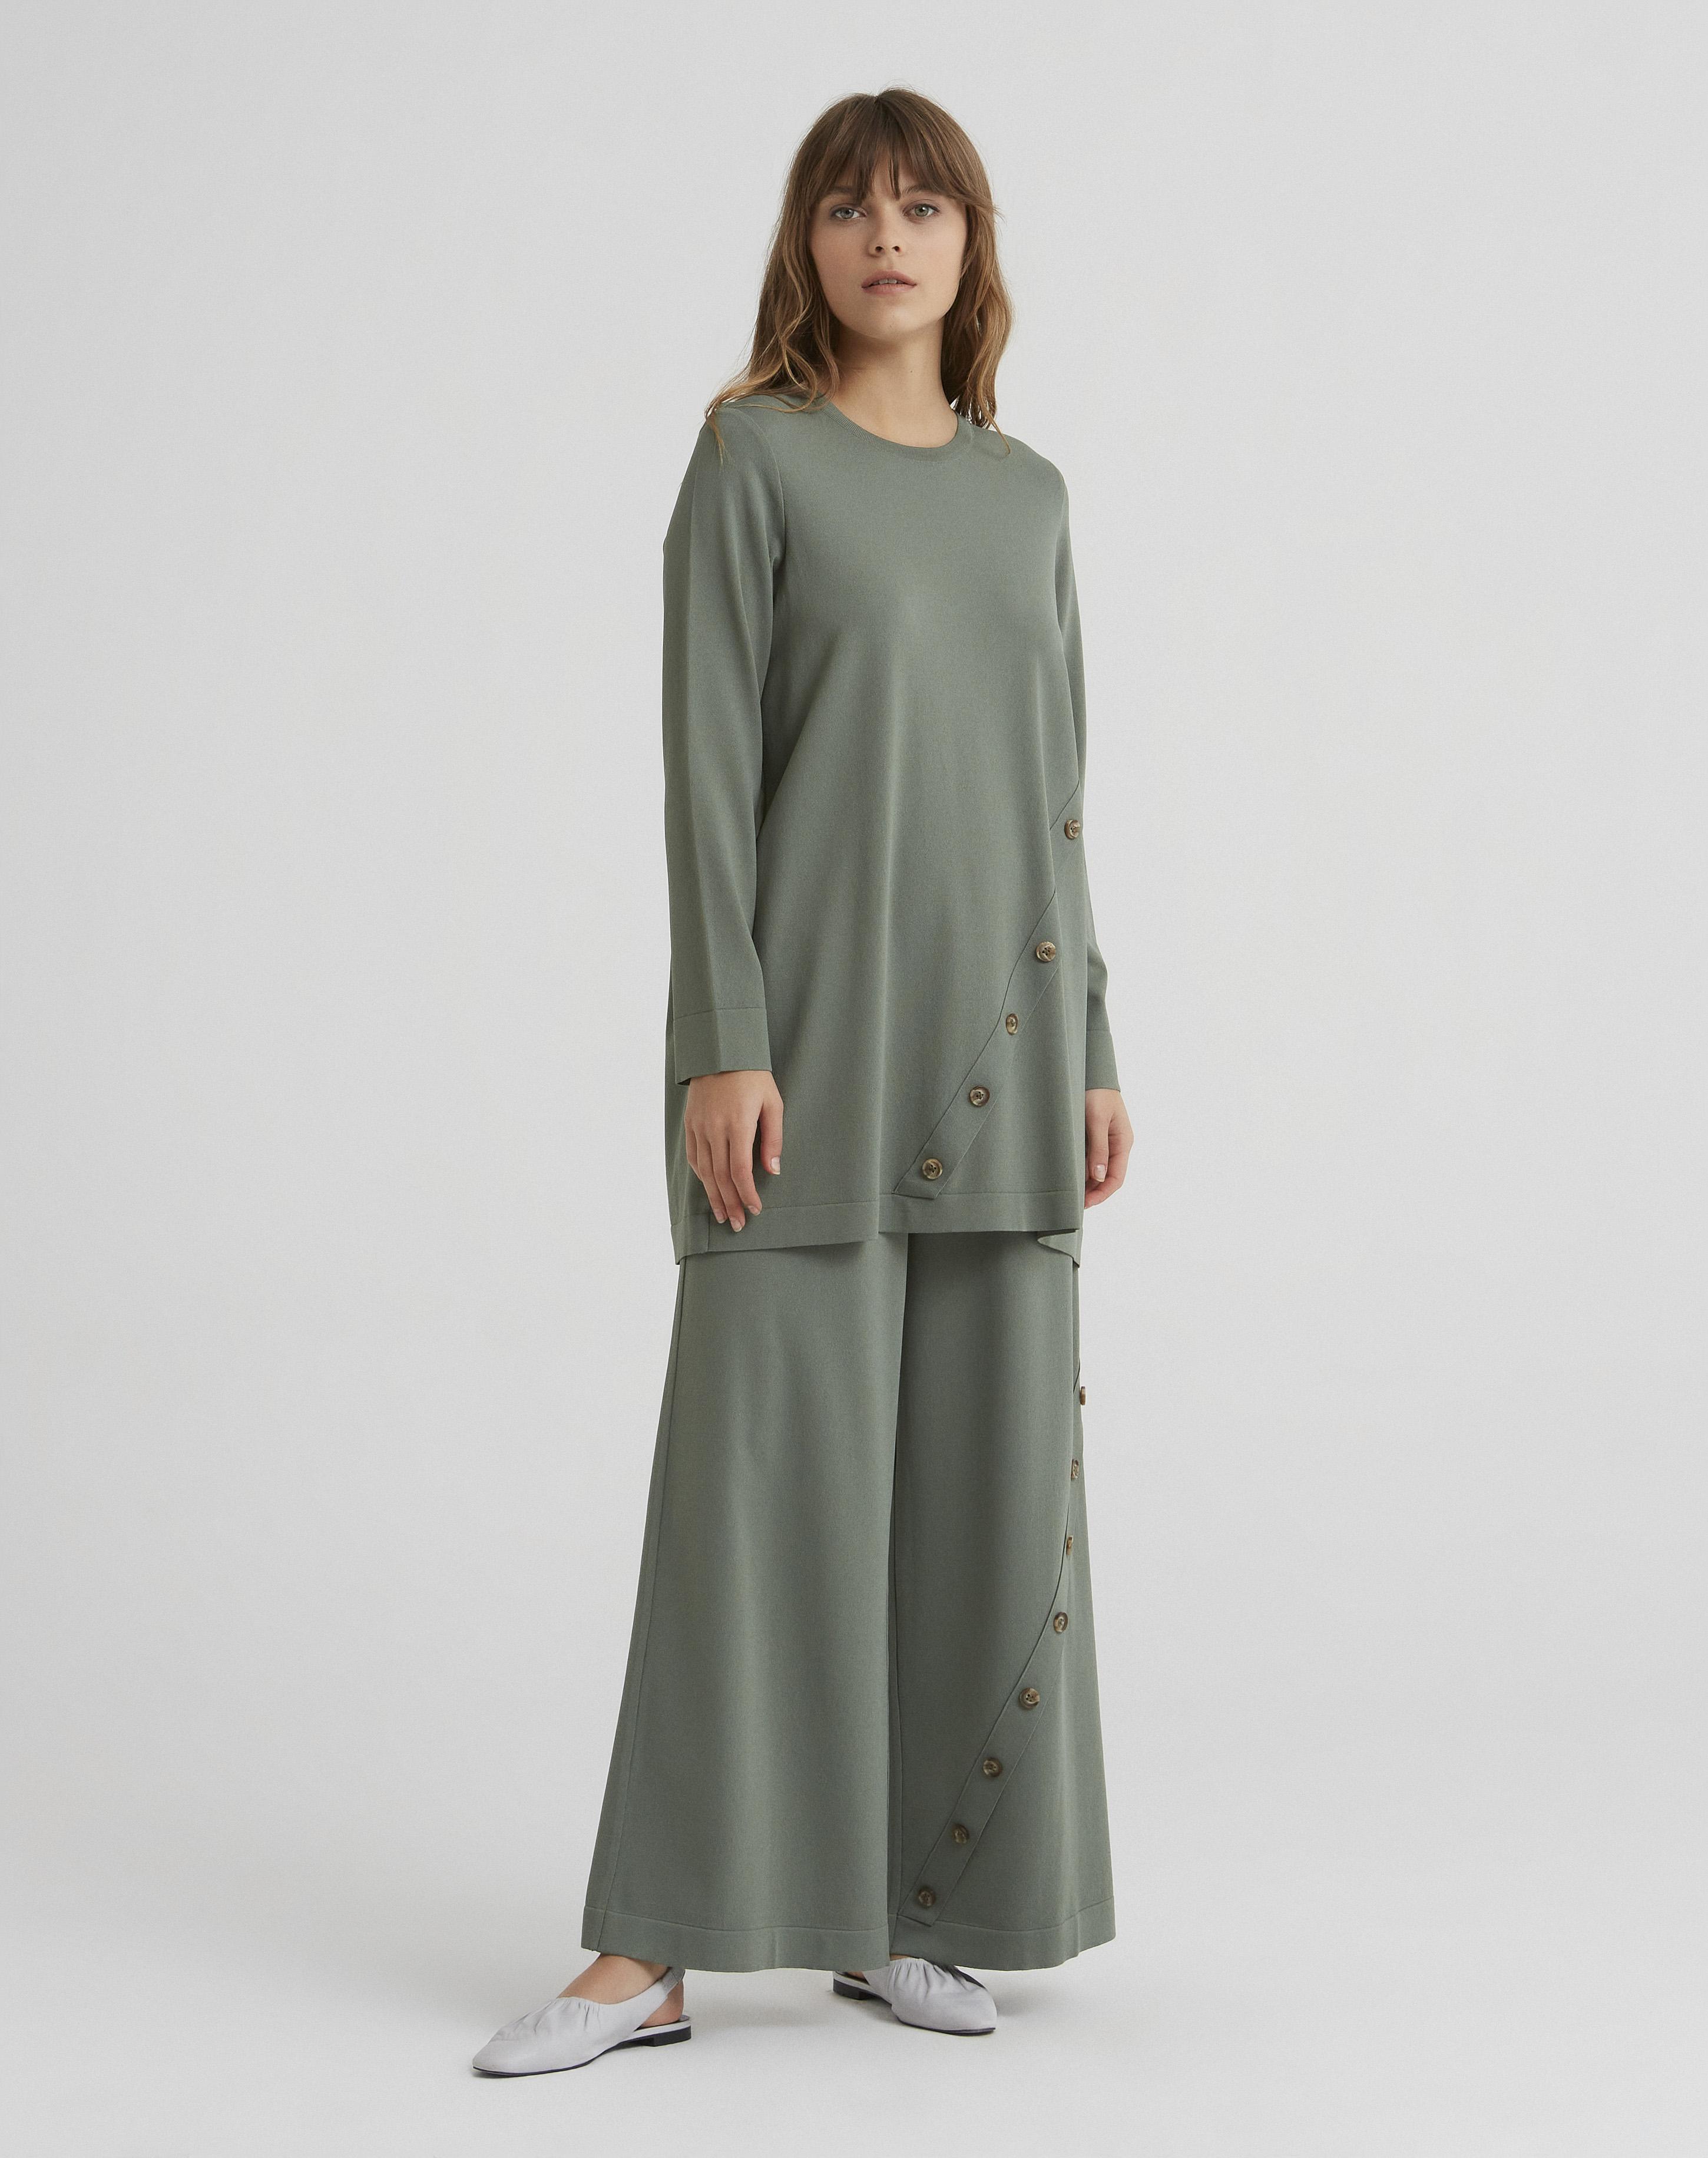 Miss Dalida - T21Y-7017 Paçası Düğme Detaylı Bol Paça Triko Pantolon